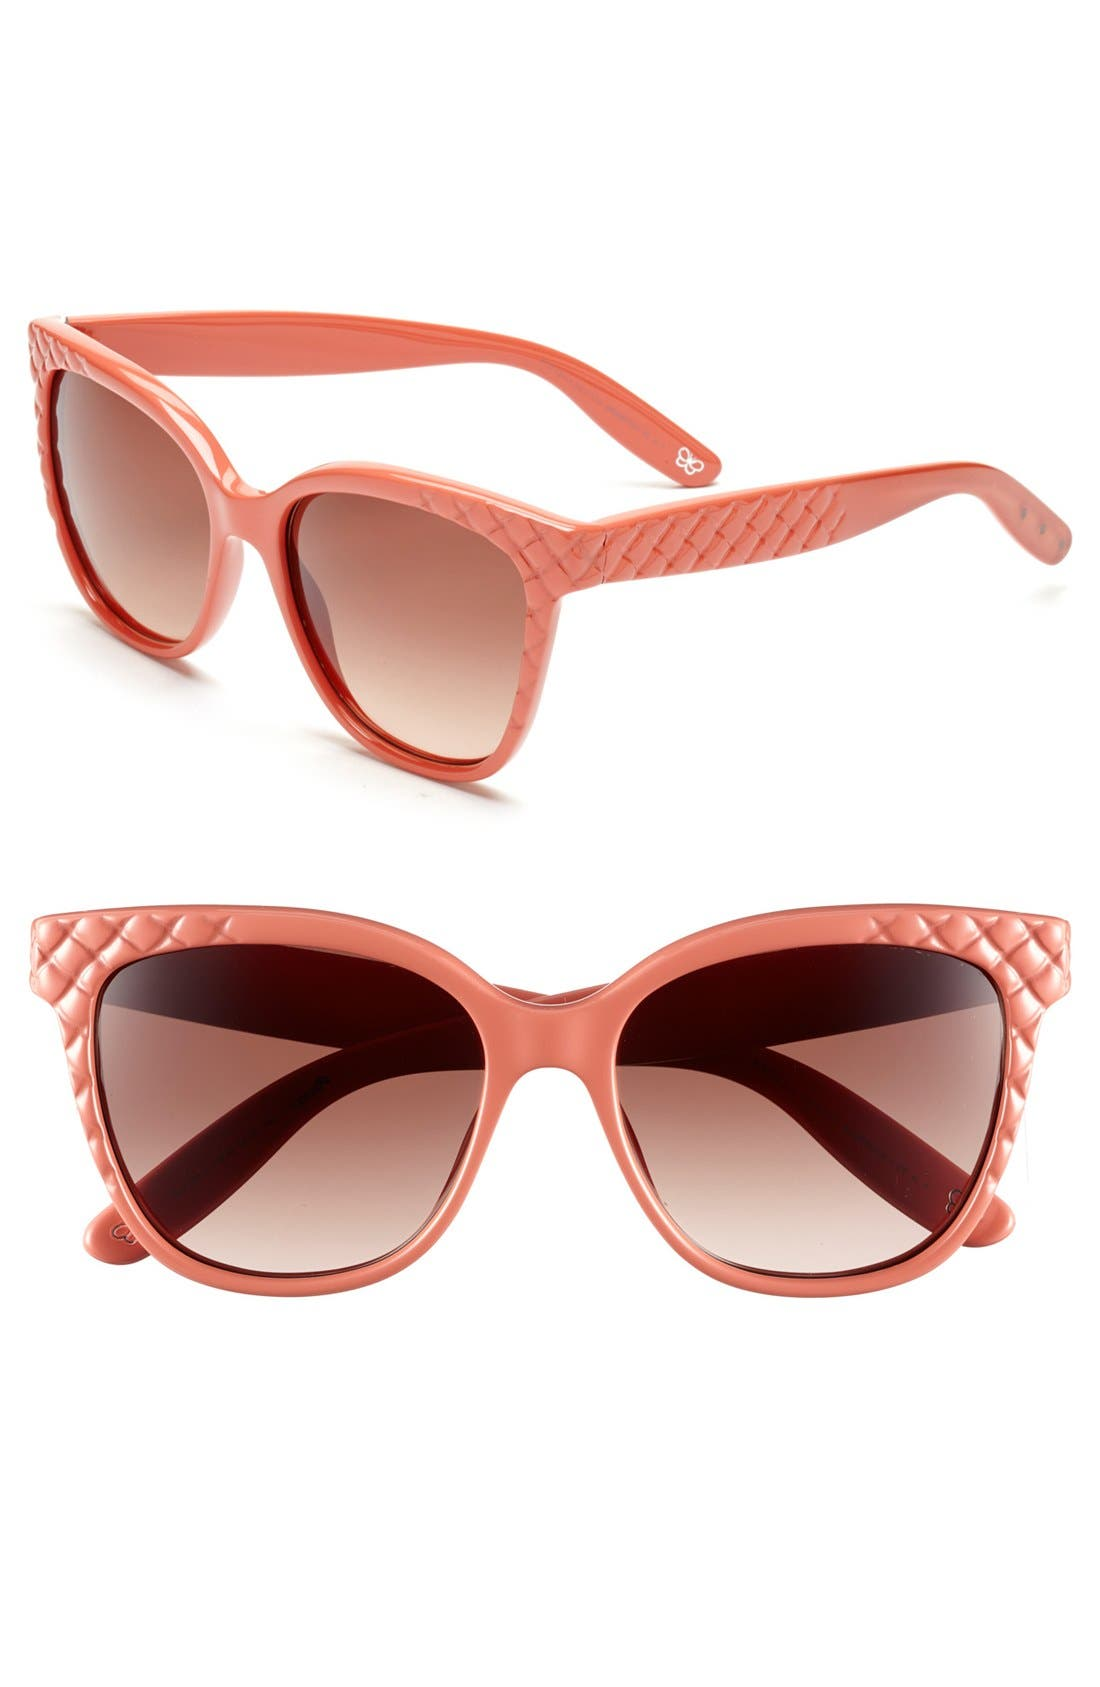 Alternate Image 1 Selected - Bottega Veneta 55mm Retro Sunglasses